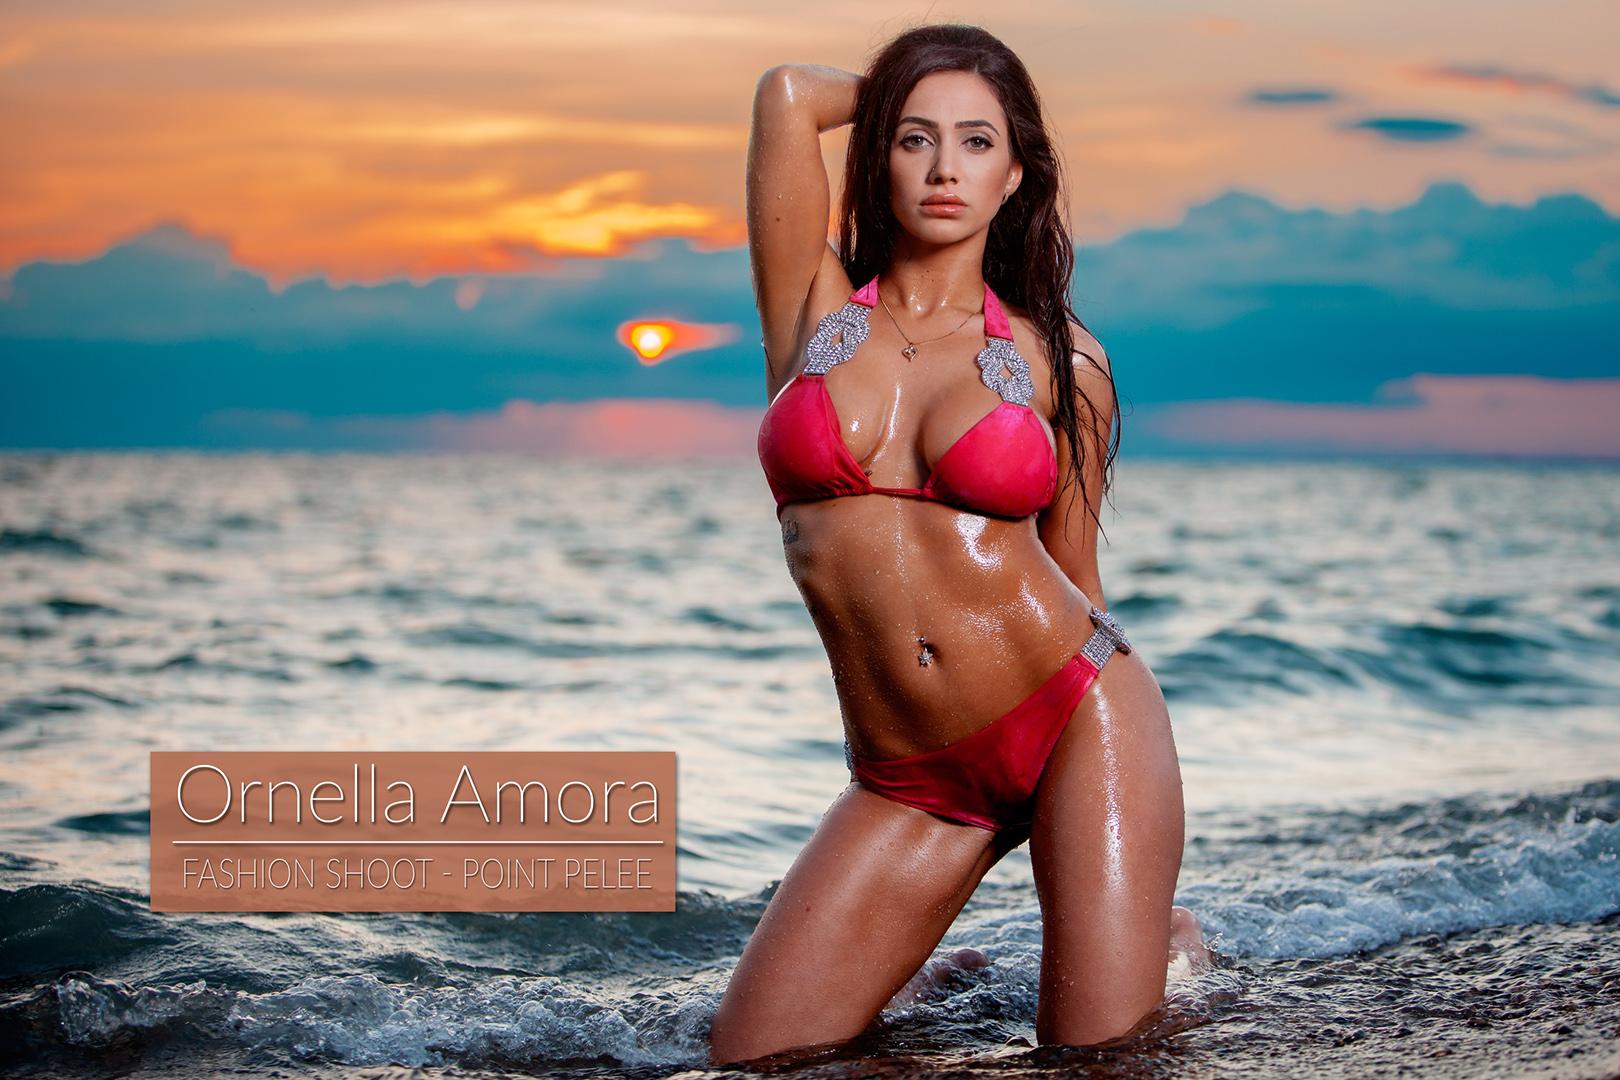 Fashion Shoot - Ornella Amora